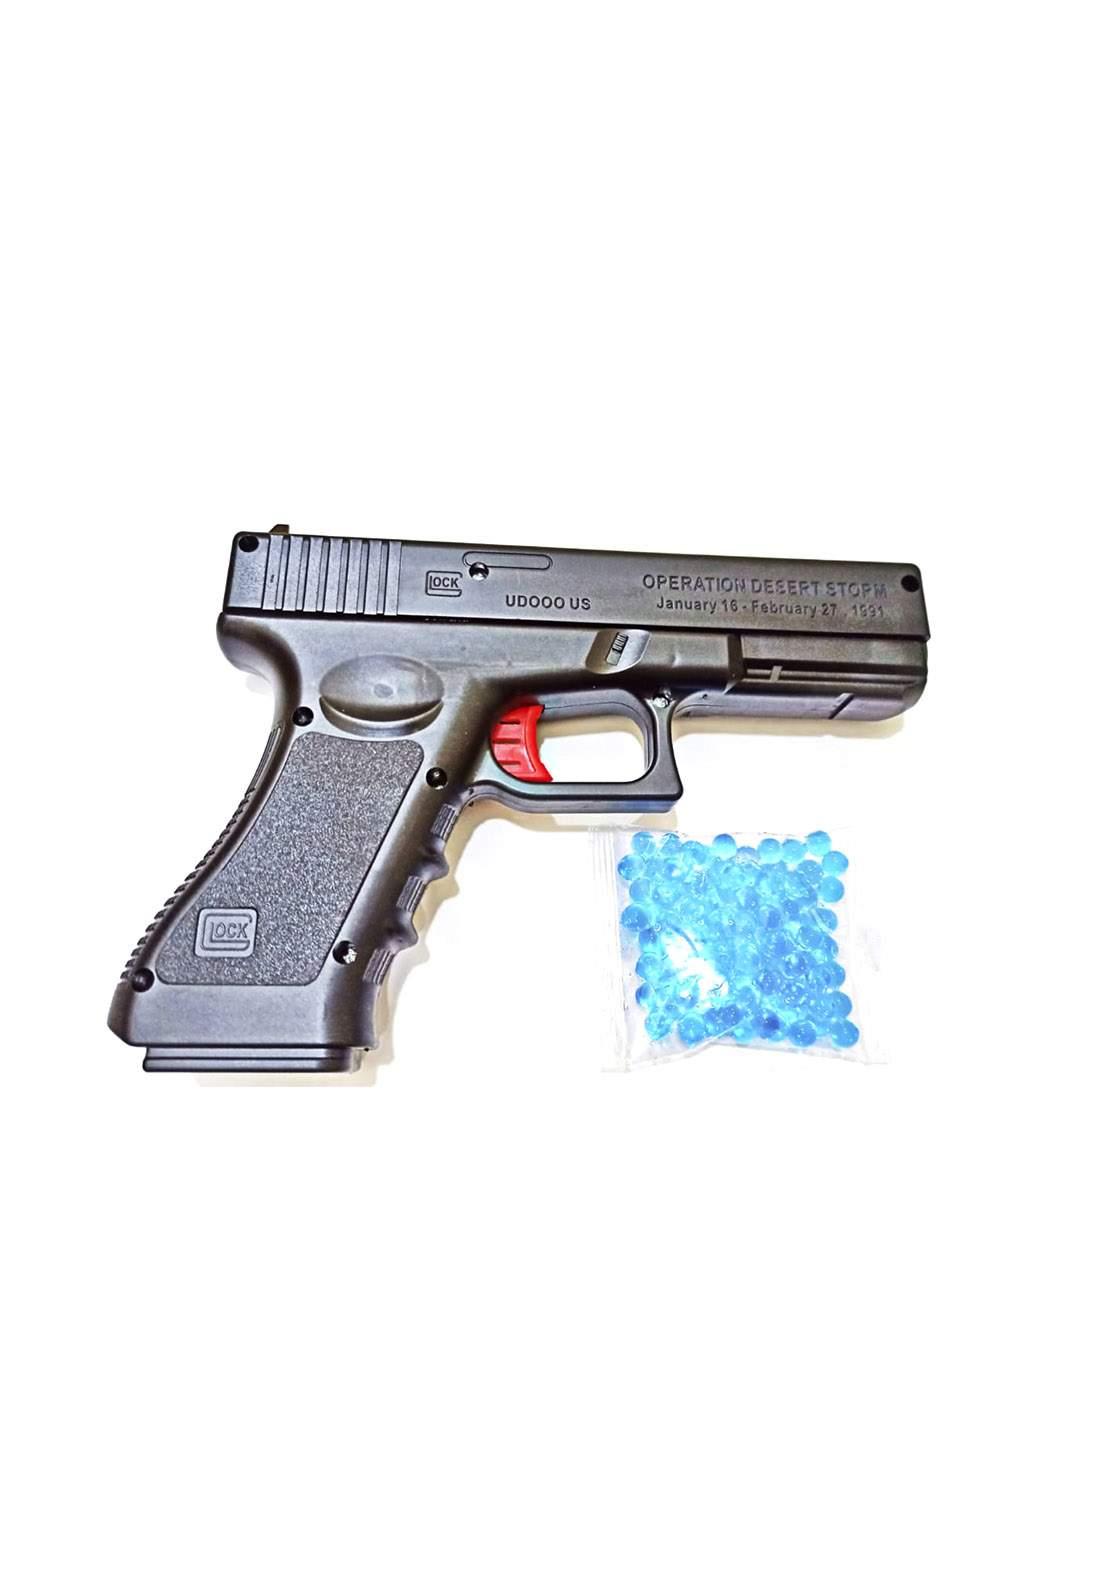 Gun Toy for Kids لعبة للأطفال